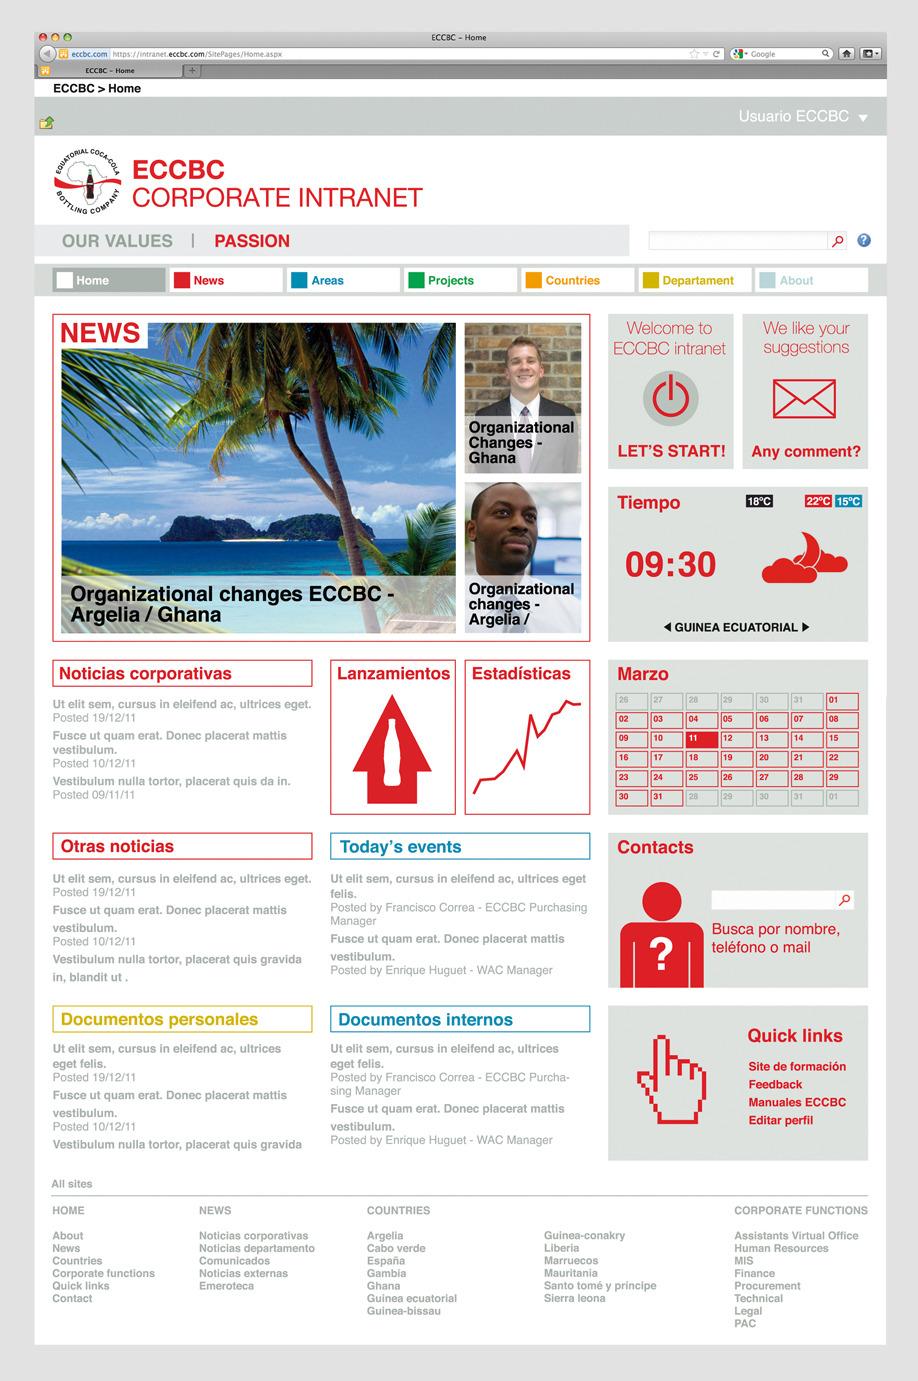 booth intranet Equatorial Coca-Cola Bottling Company / corporate intranet - gira